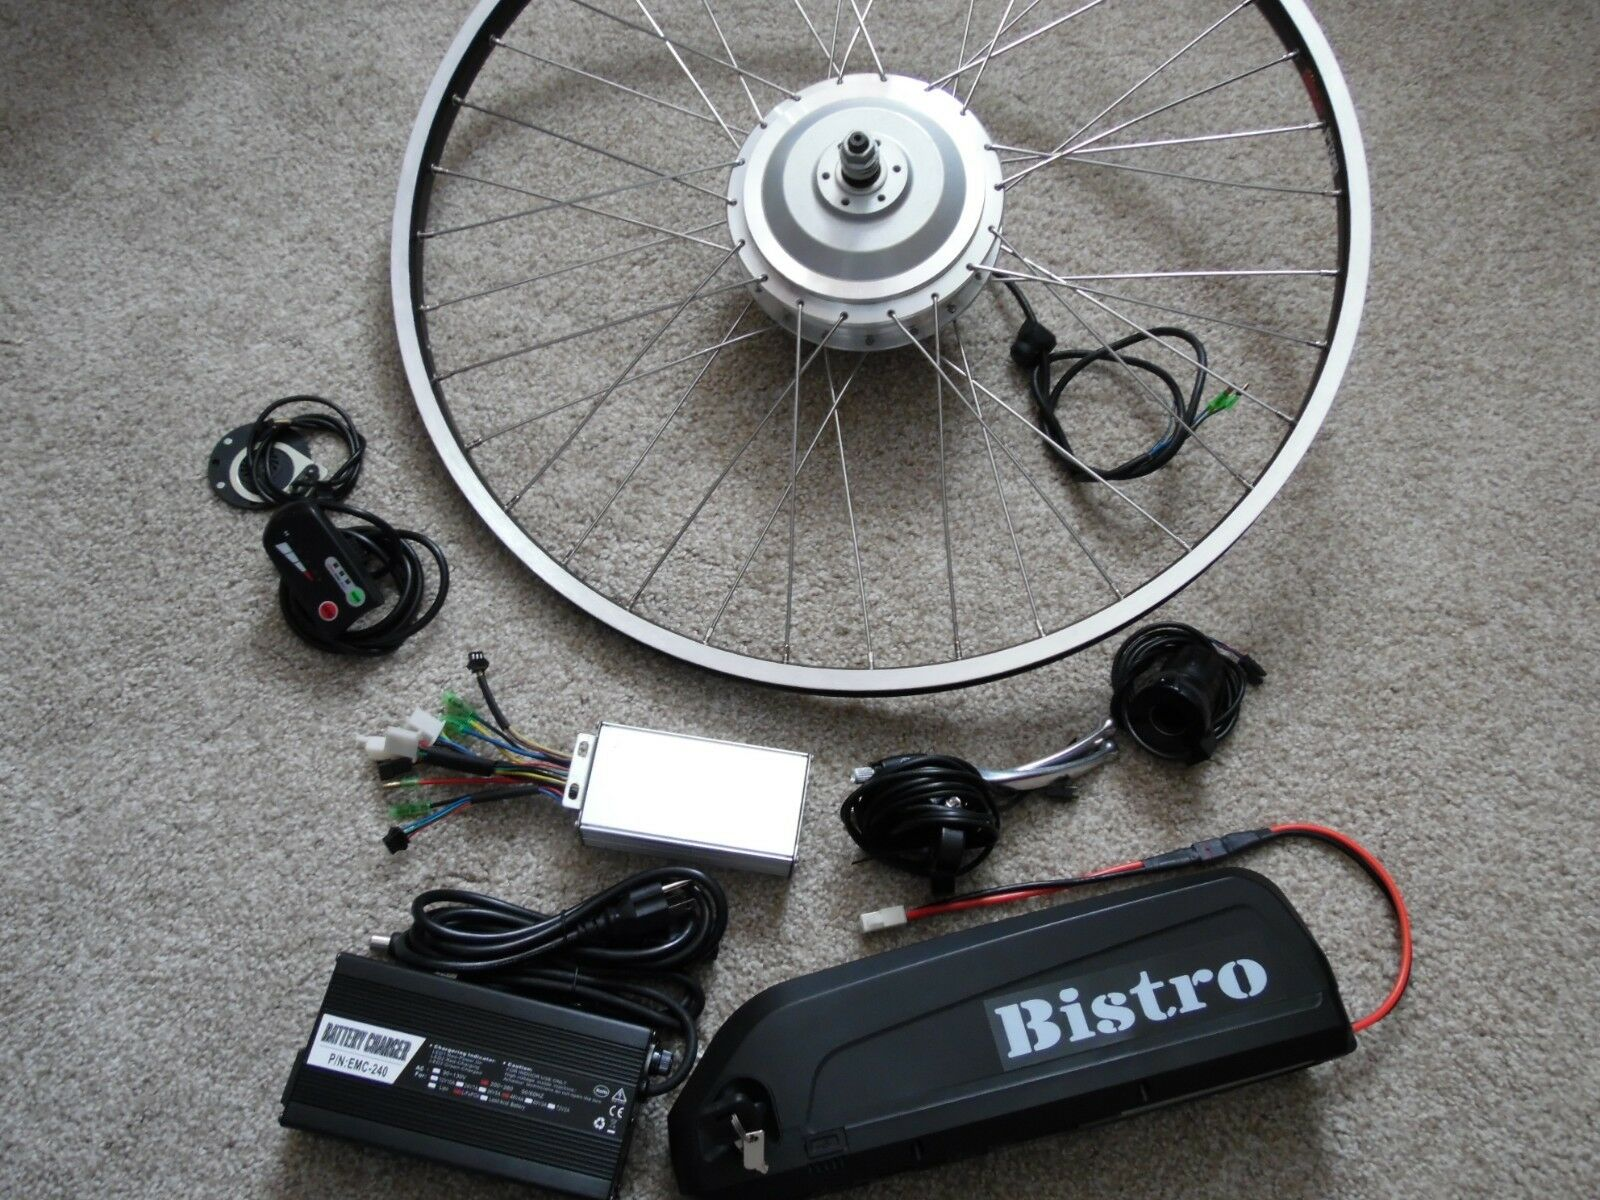 Bistro electric bike 29  disc motor 48V 1400W  Max hill climber  17ah battery  quality assurance